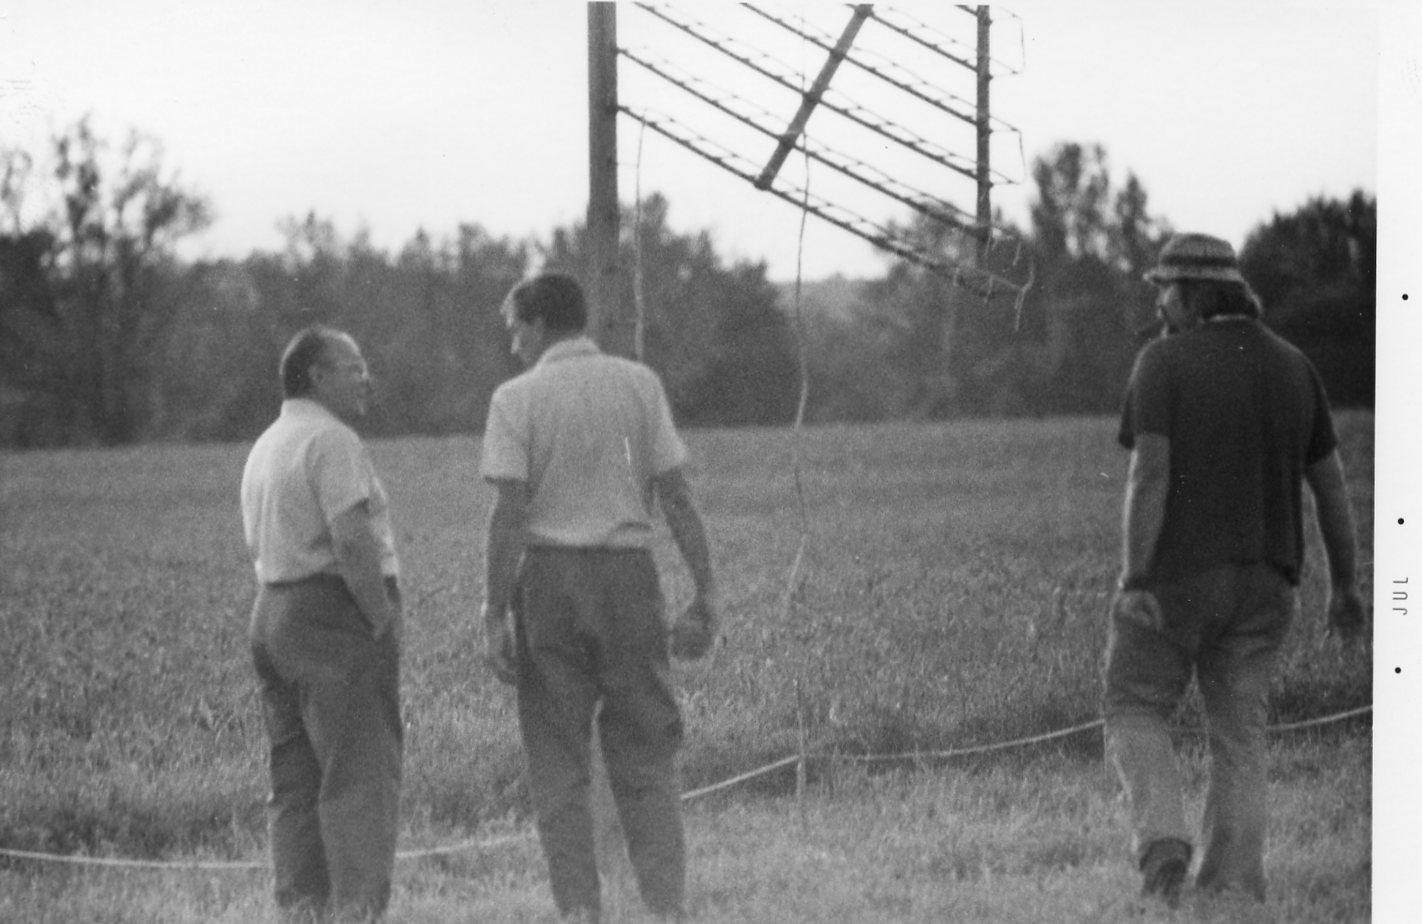 3 men standing in front of american flag firework